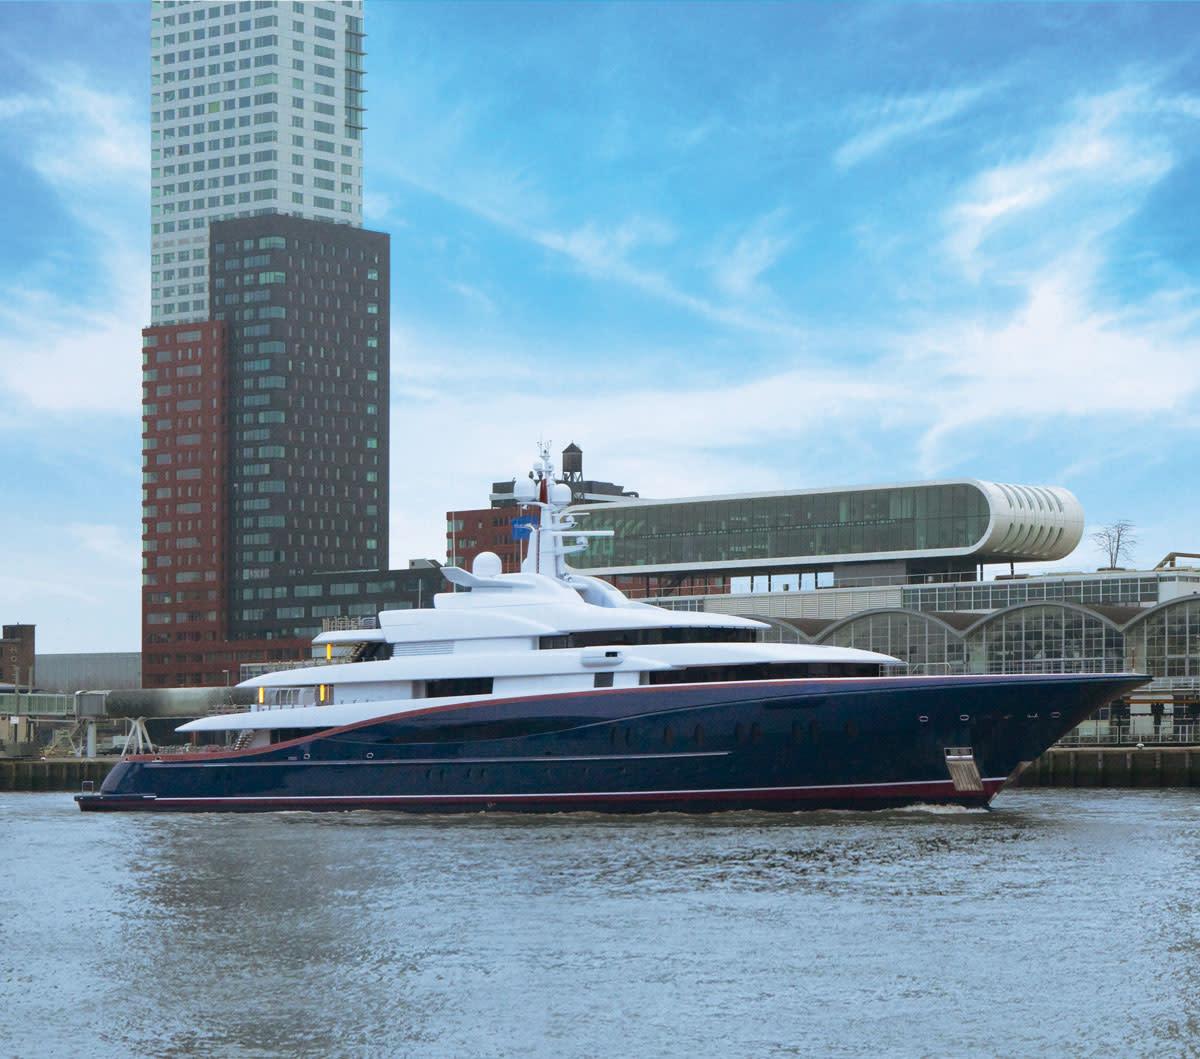 ø Yachts, SuperYachts ø | Yachts, SuperYachts, Huge Yachts